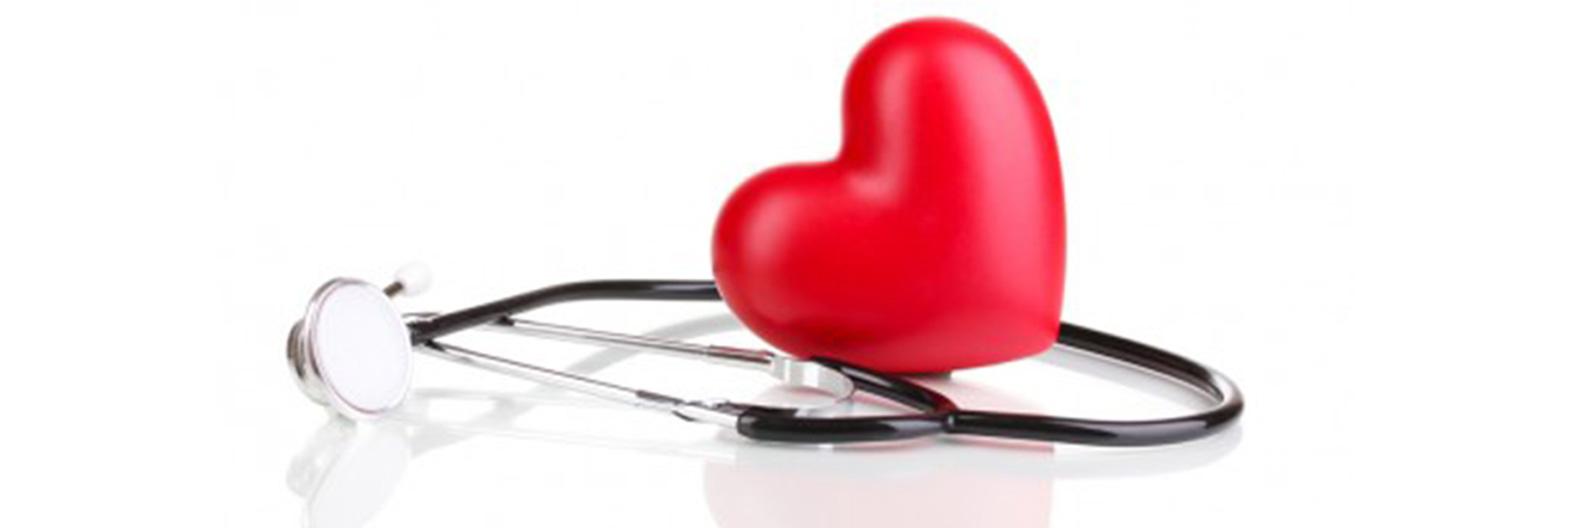 litinis mišinys sergant hipertenzija)